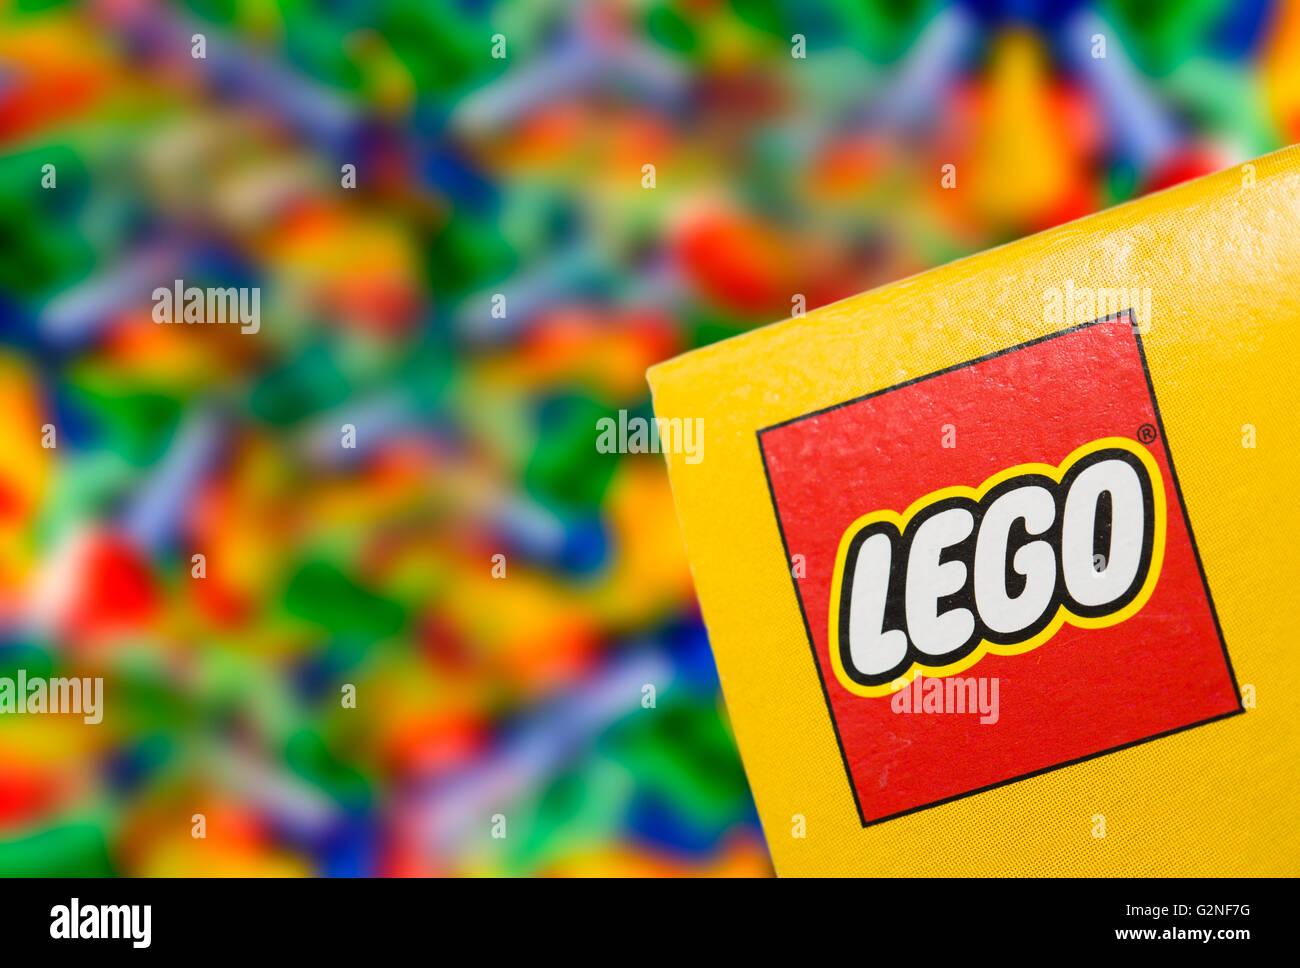 BELCHATOW, POLAND - January 06, 2015: Illustrative editorial photo of logo LEGO on the box. - Stock Image